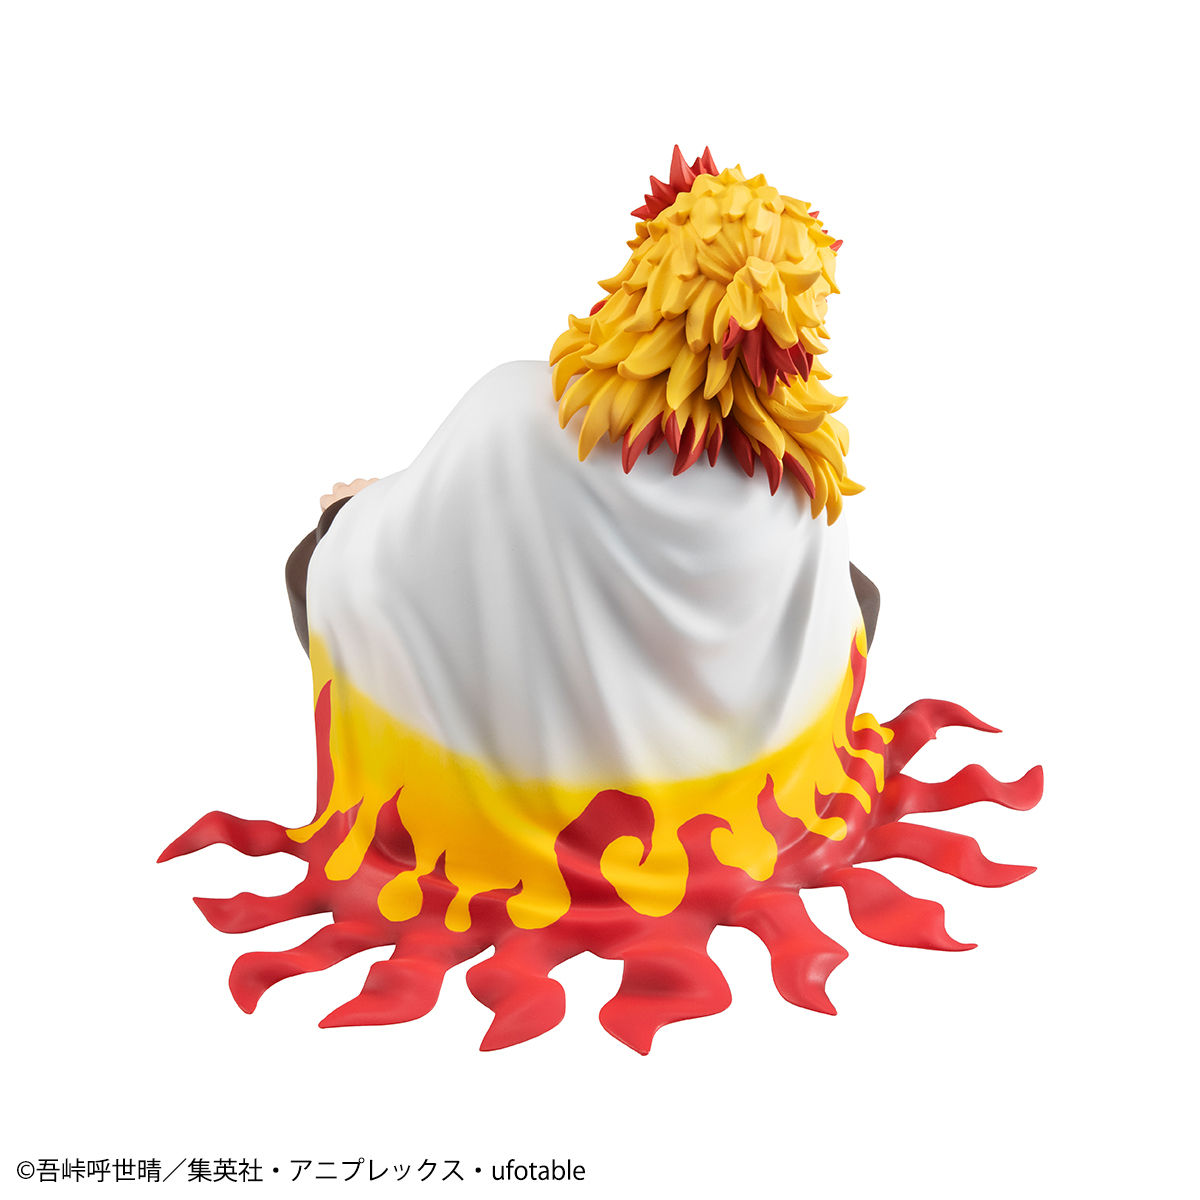 G.E.M.シリーズ『てのひら煉獄さん』鬼滅の刃 完成品フィギュア-004